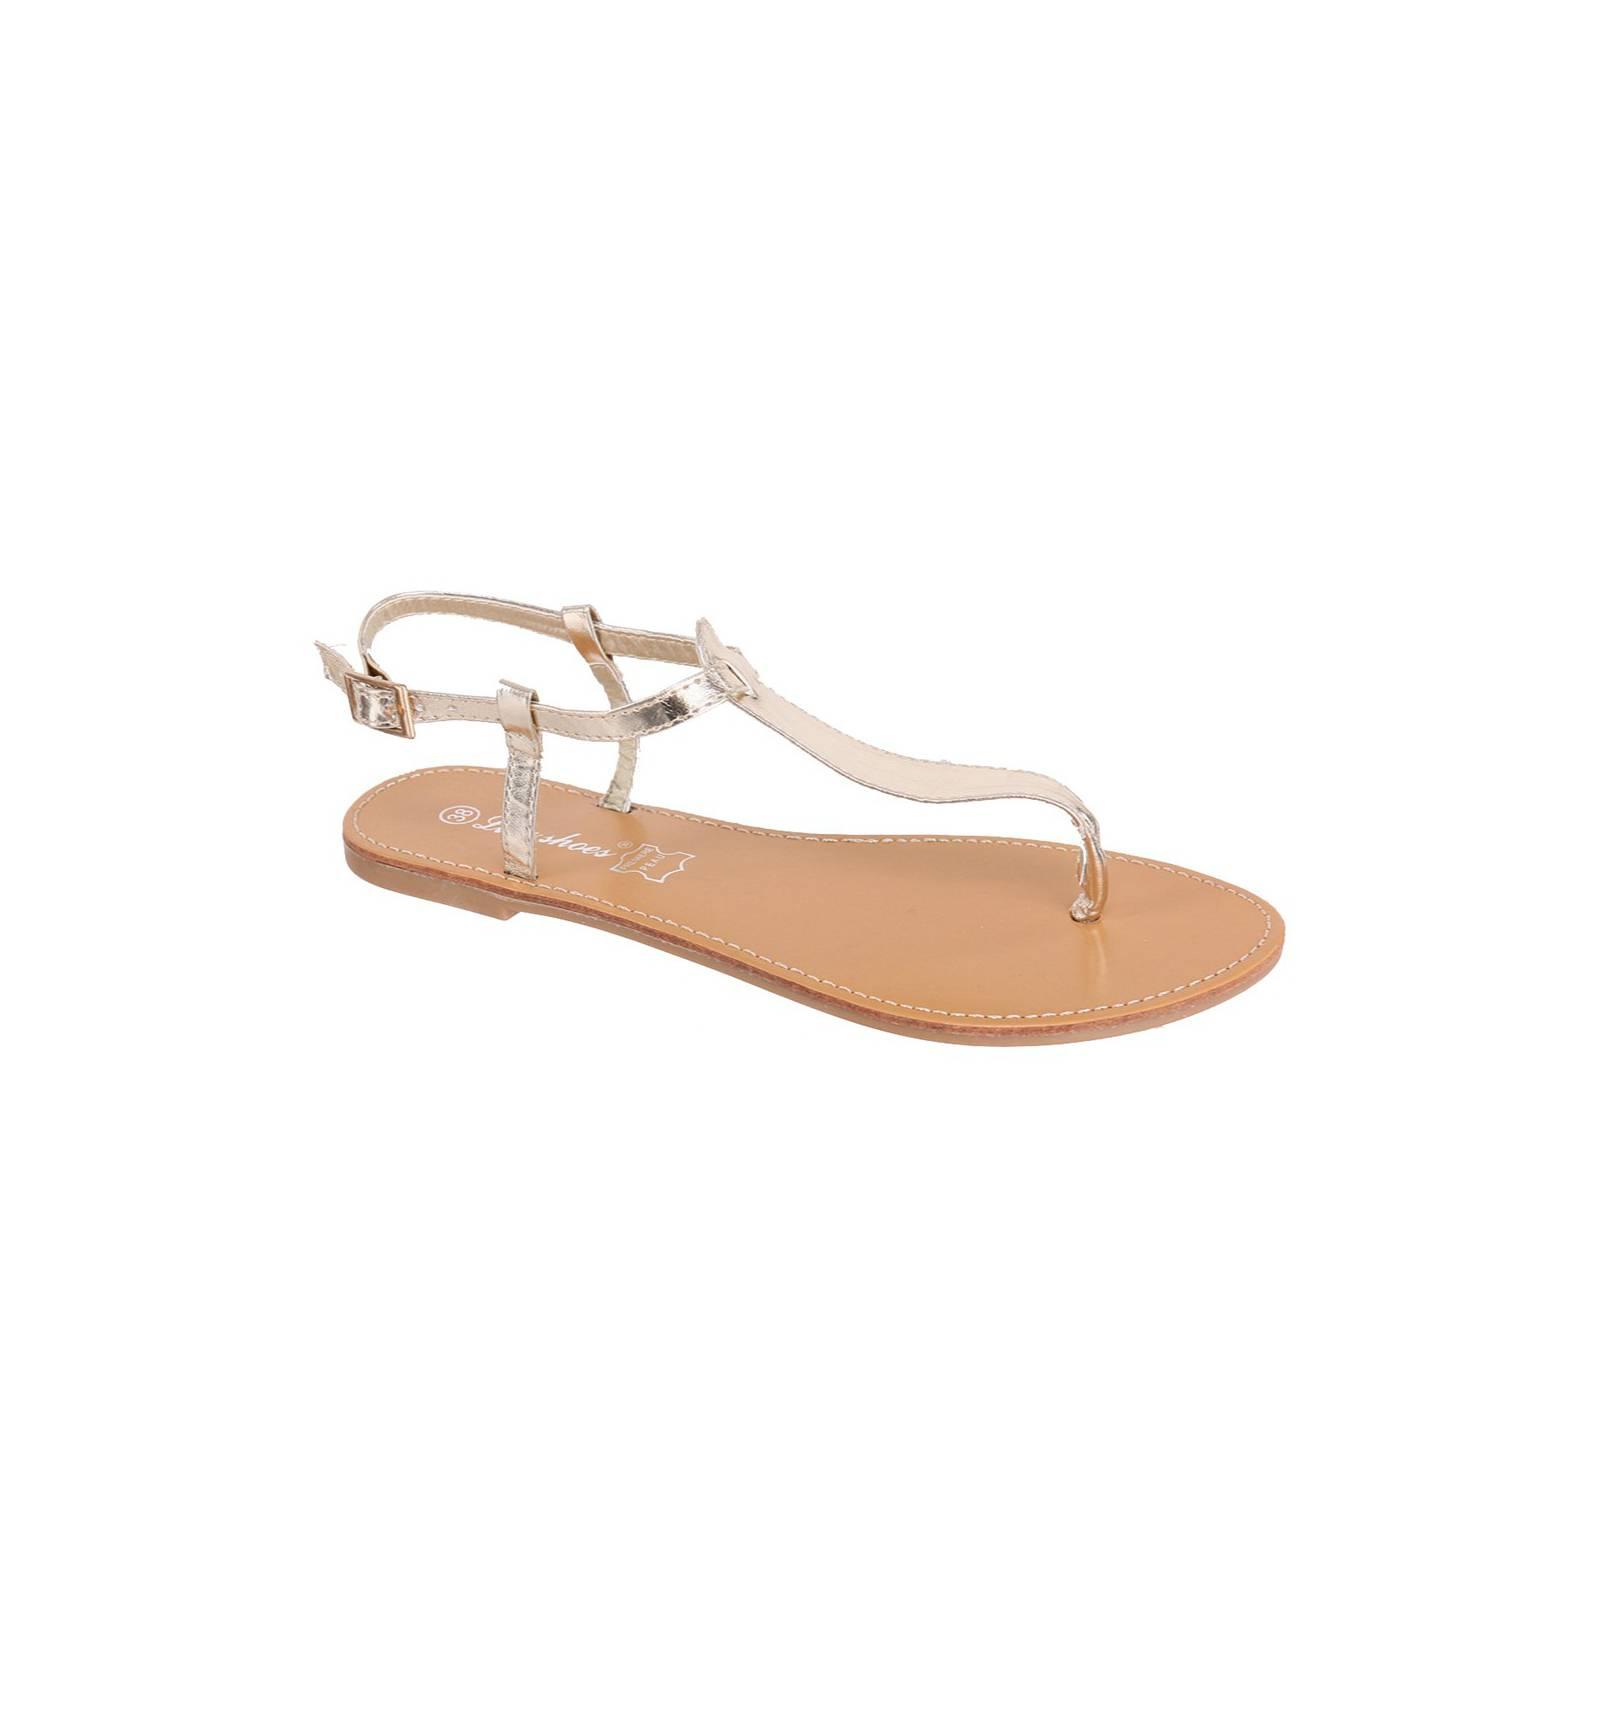 sandales plates femme couleur dor mod le ibiza. Black Bedroom Furniture Sets. Home Design Ideas